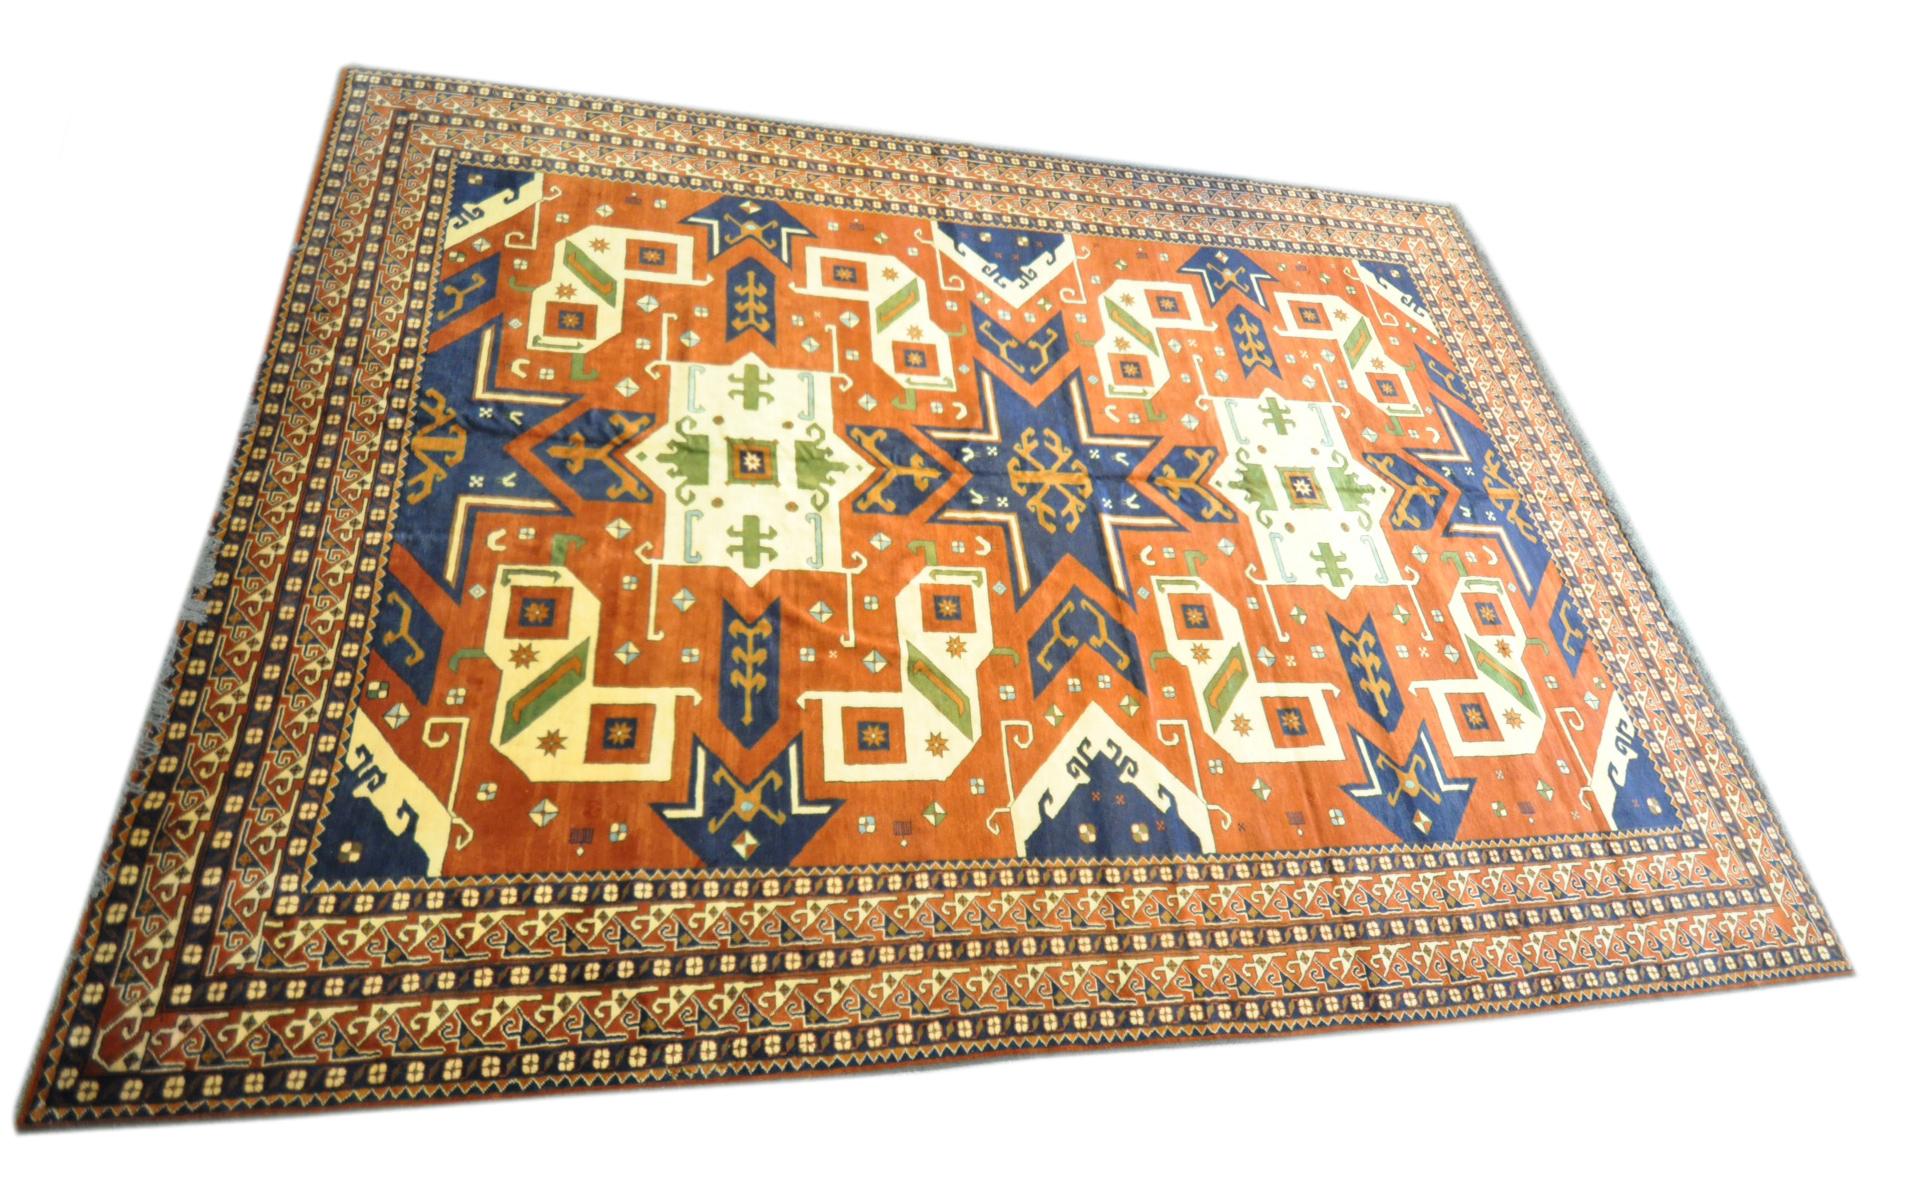 Tibetan rug $1000 (estimated value $3000)